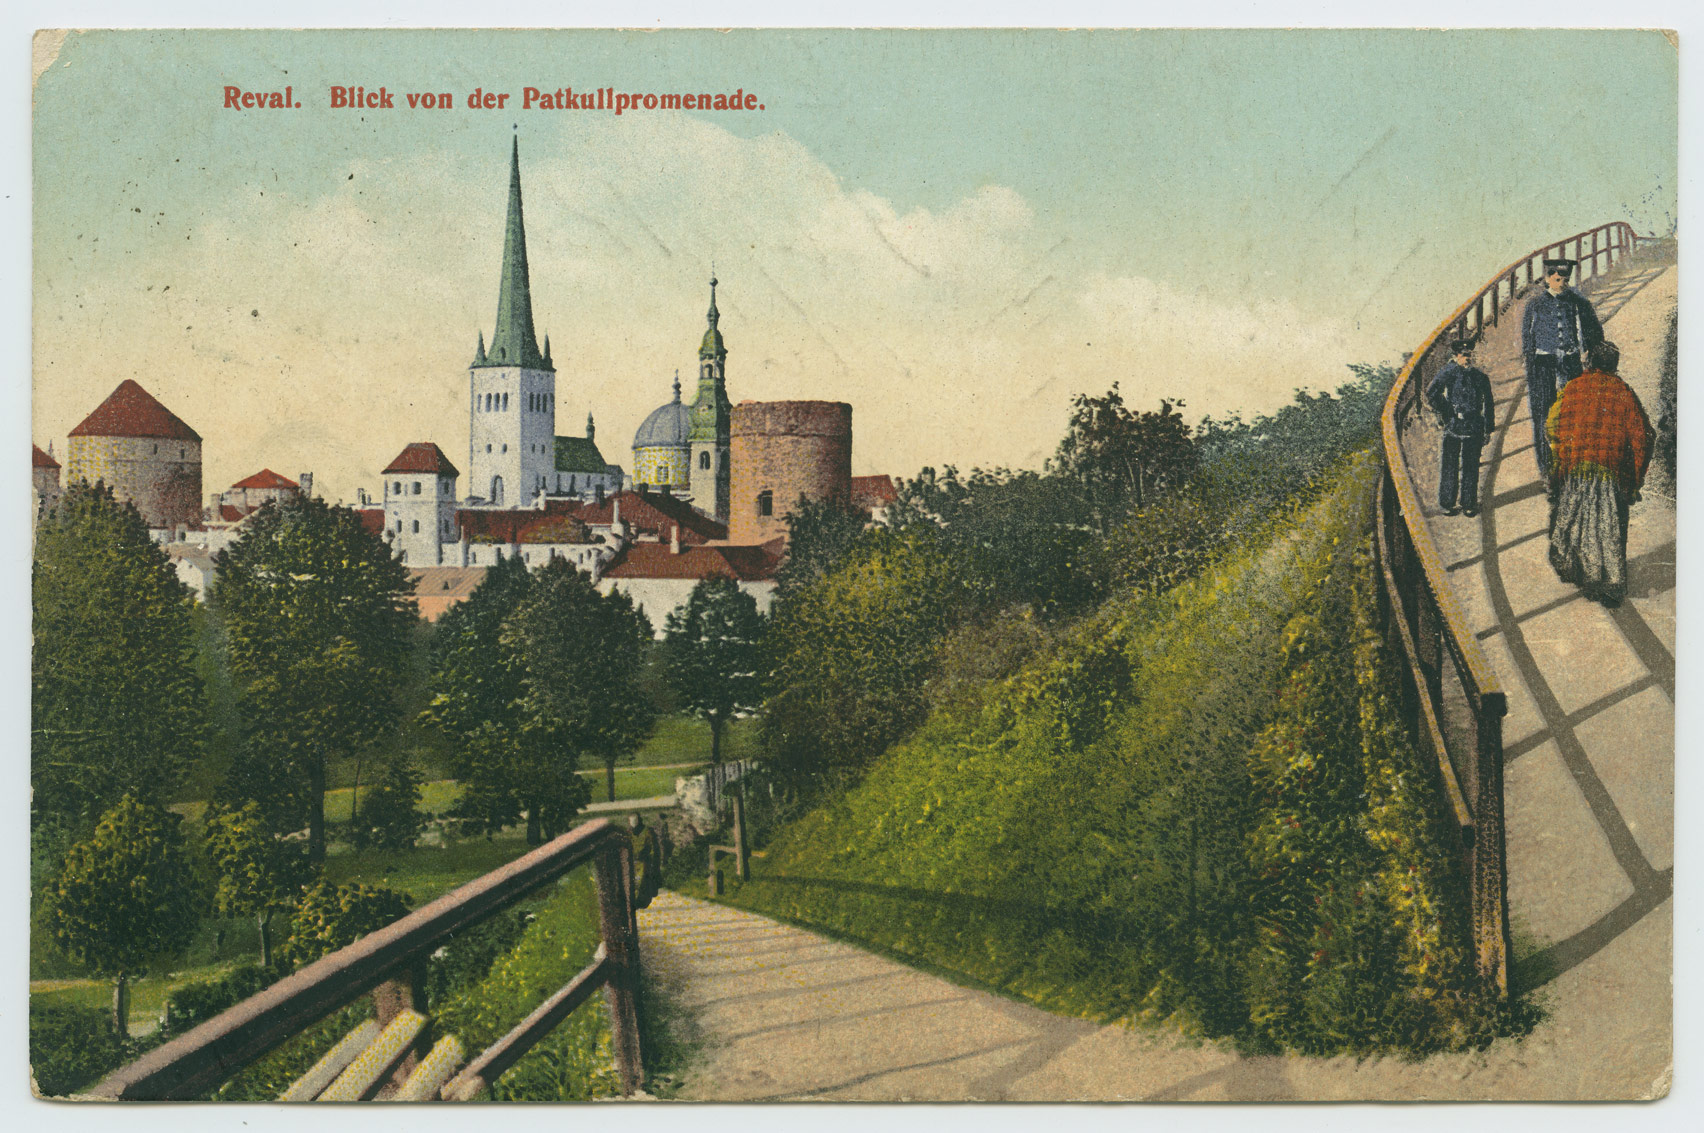 1208b-Rohstoff-und-Händelsabteilung-AOK-8-Reval-1918-postiasjalugu-ee